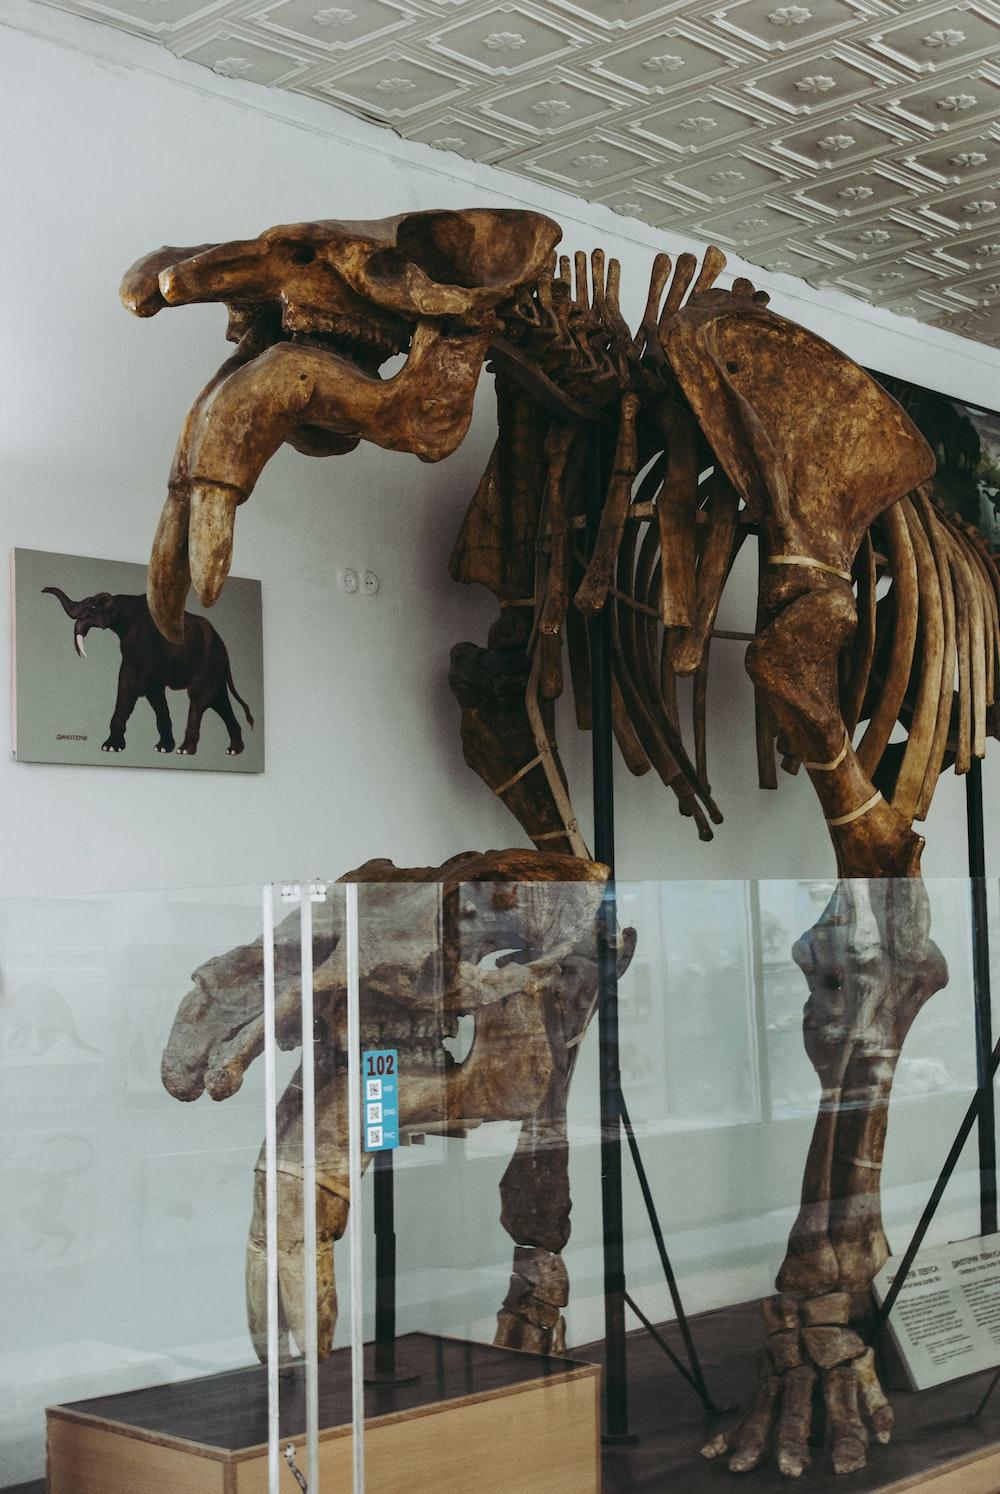 brown wooden animal figurine on glass shelf